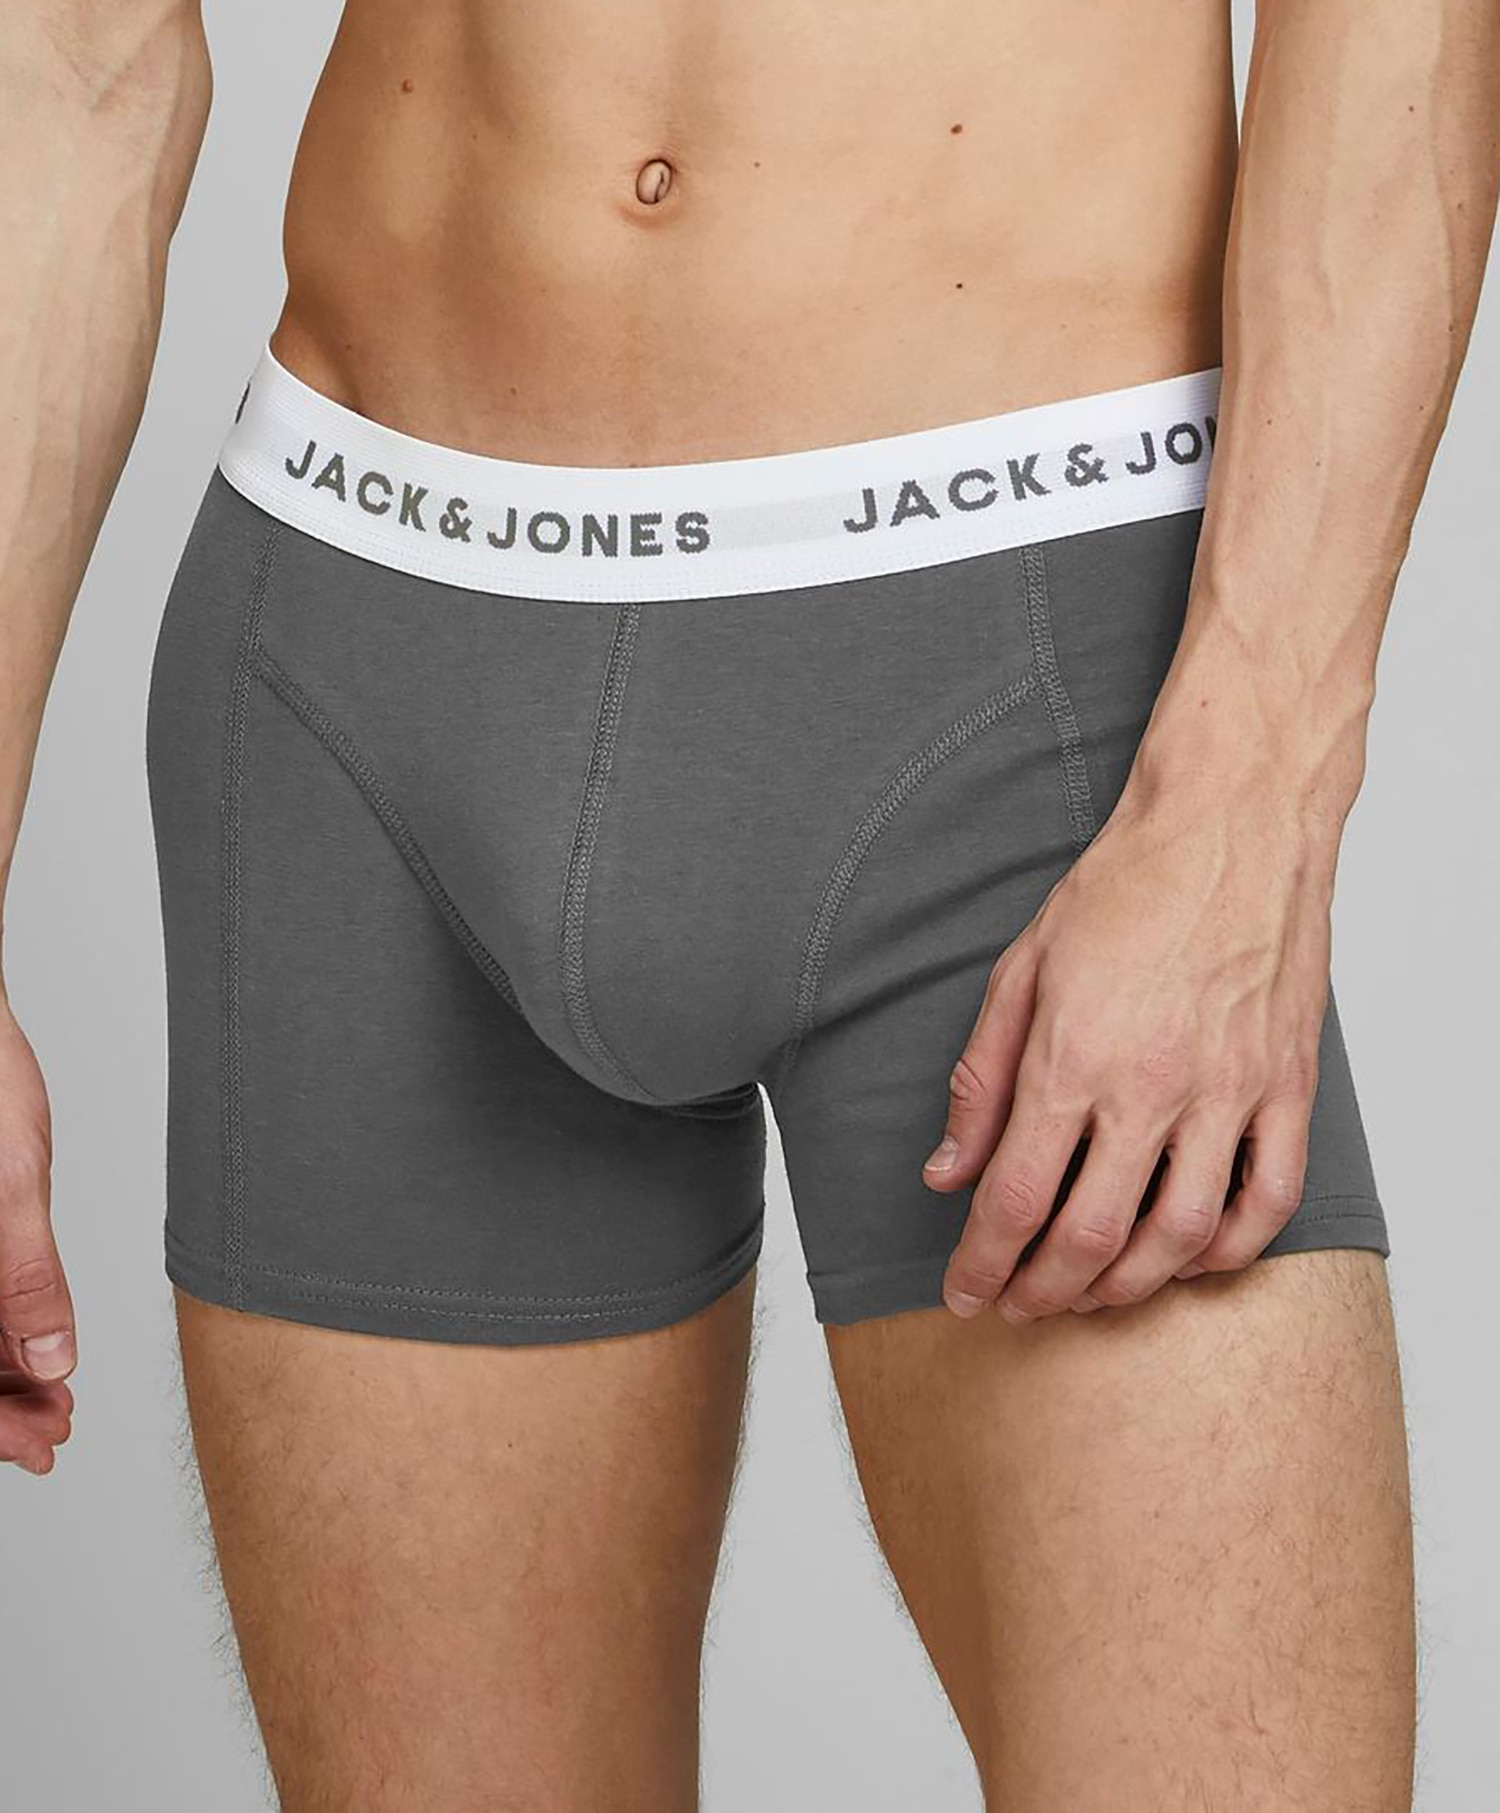 Jack&Jones 5 pk Boxer